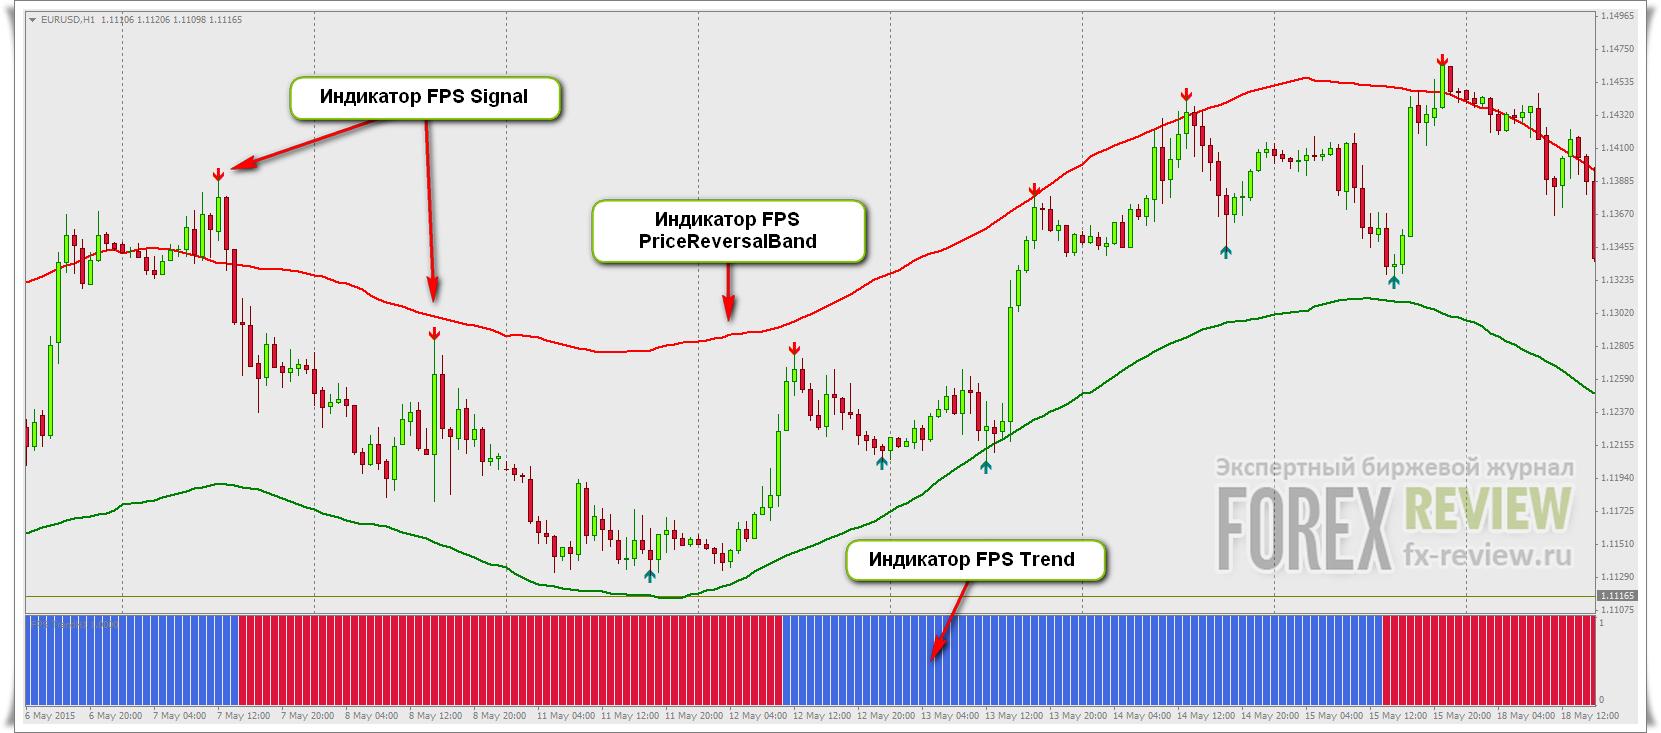 Forex pro торговая система форекс курс доллара сша к рублю на межбанковском рынке